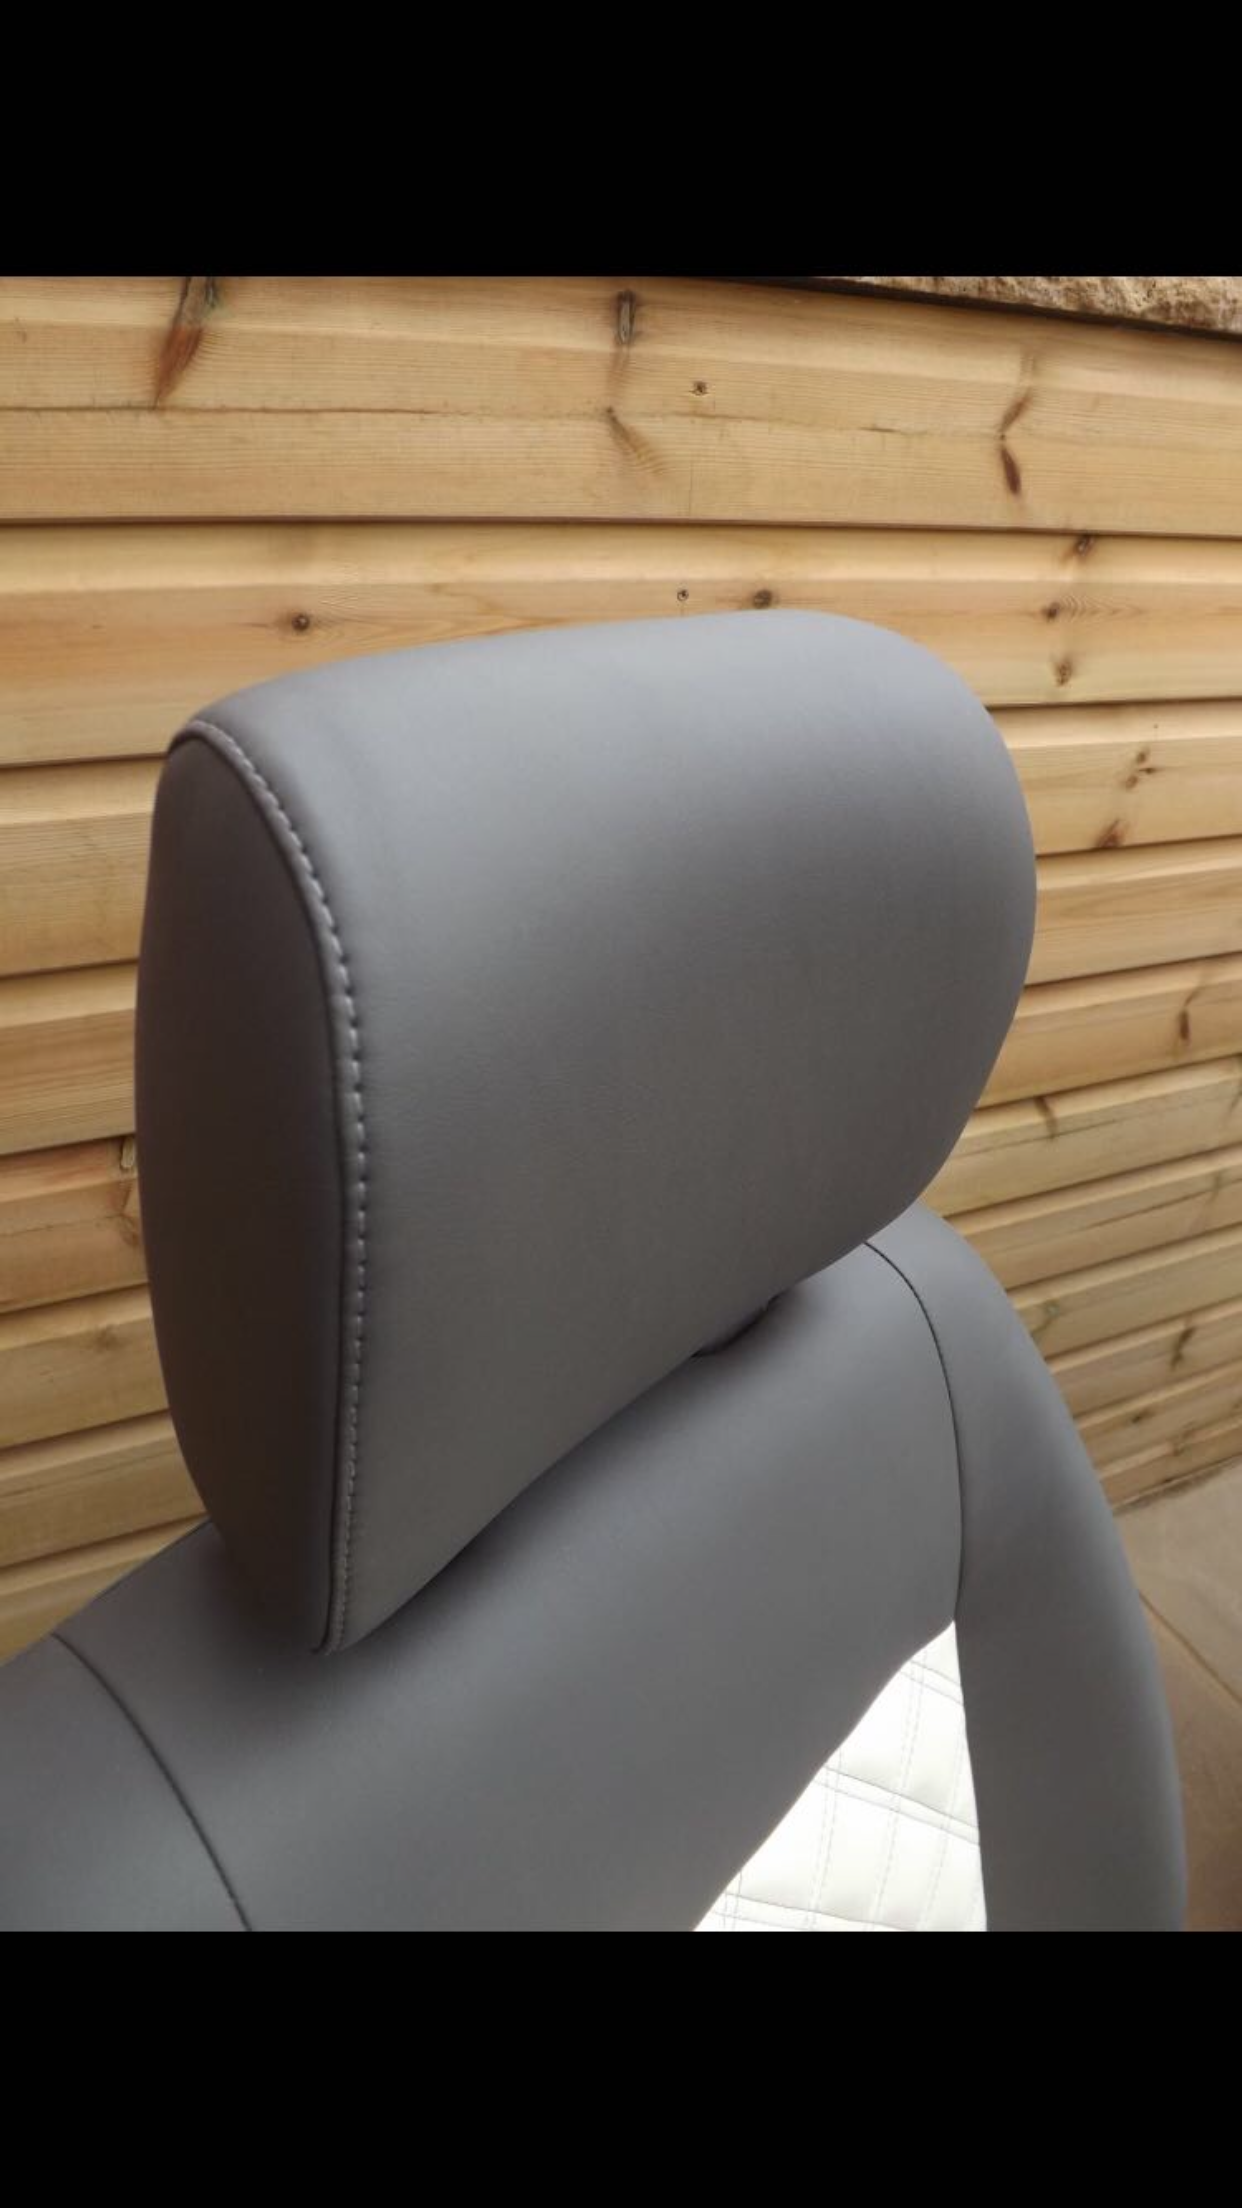 T5 headrest